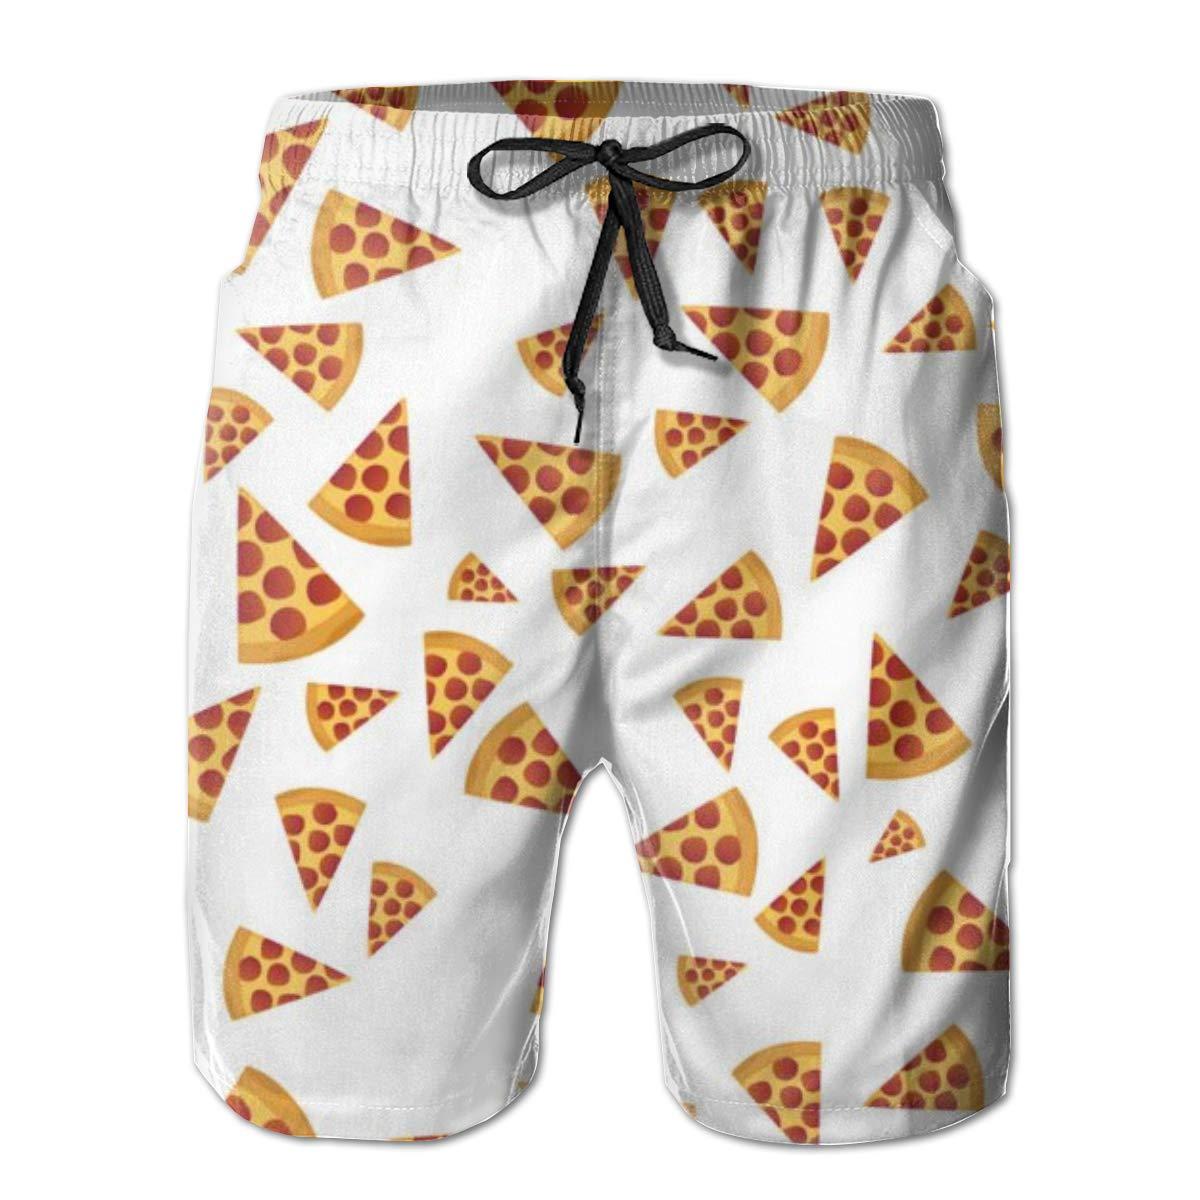 TNIJWMG Mens Board Shorts Funny Pizza Holiday Swim Trunks Mesh Lining